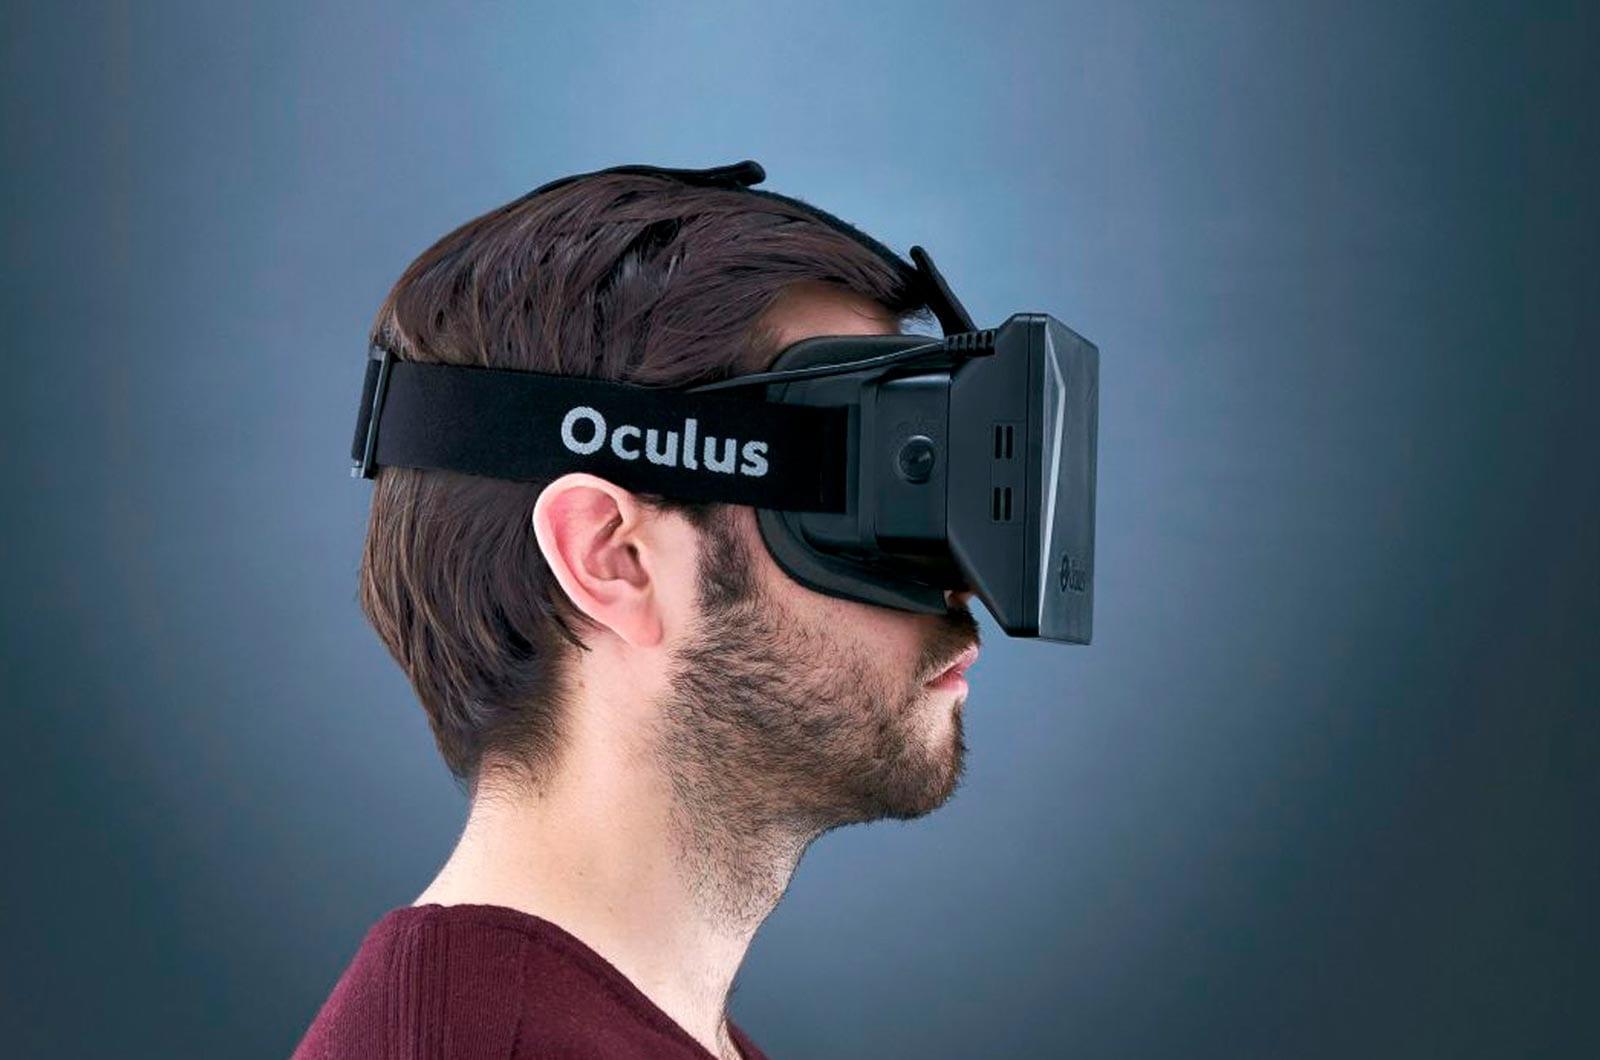 Oculus-Rift-Imersive-VR-Feat-Image-360-Virtual-tours